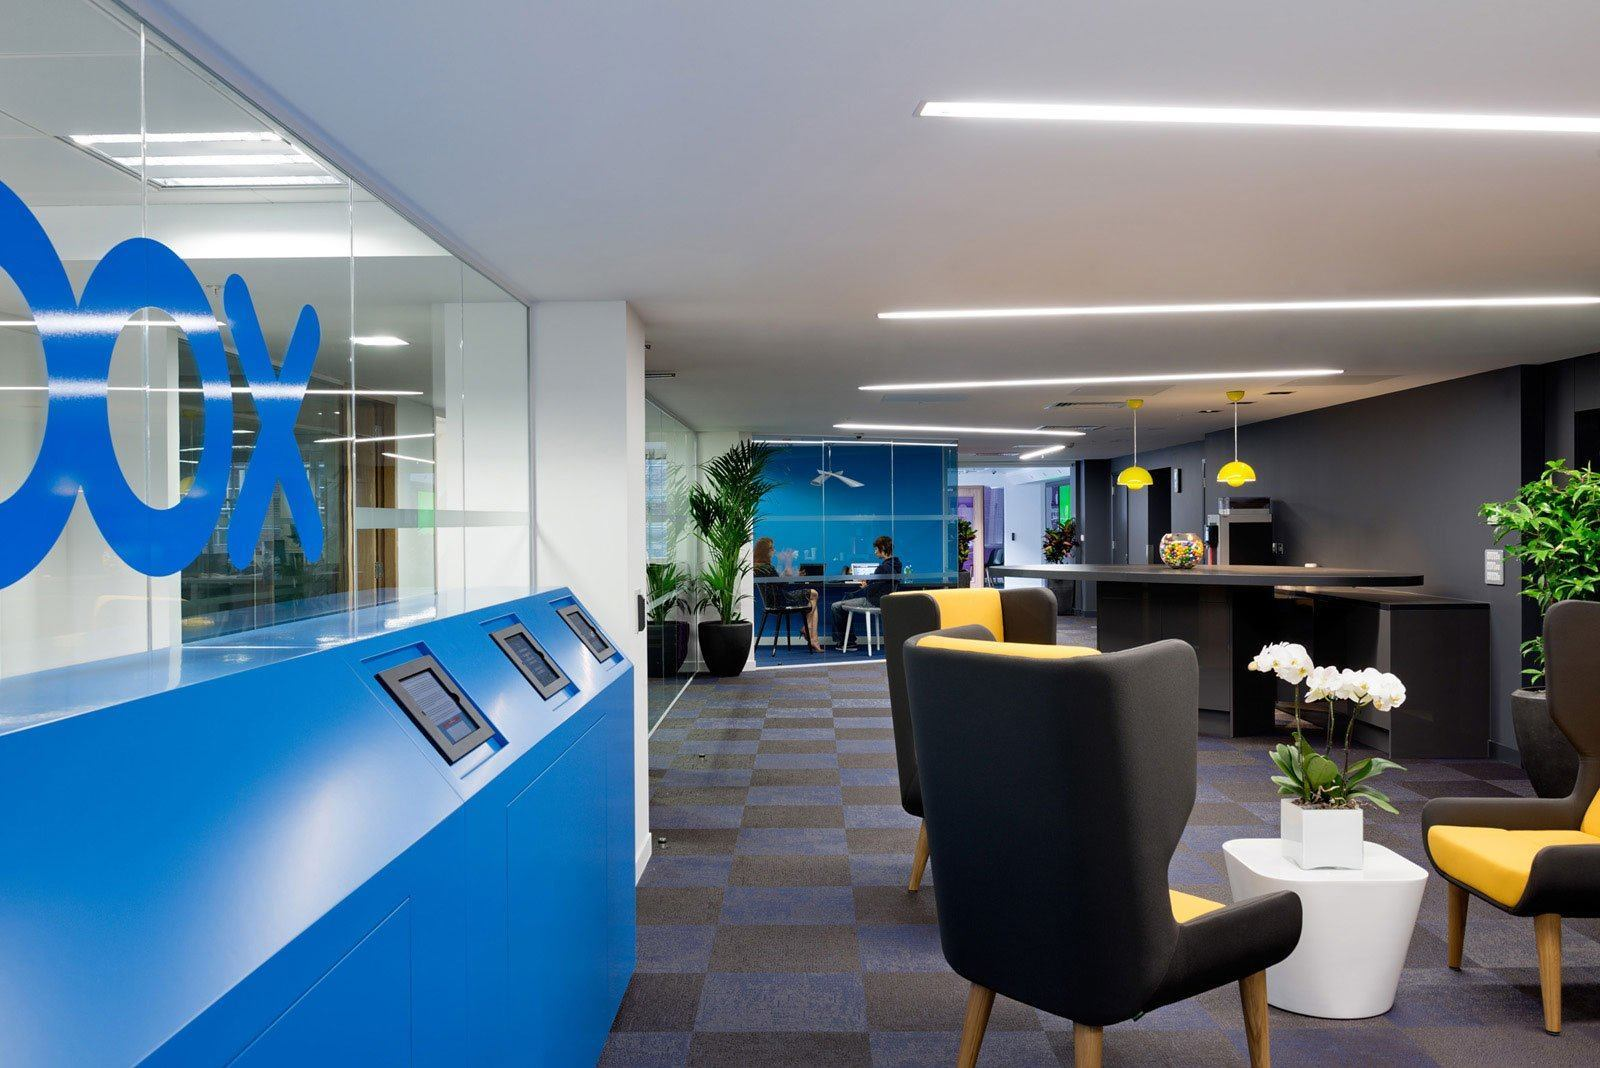 Inside box s london offices officelovin 39 for Interior design office london